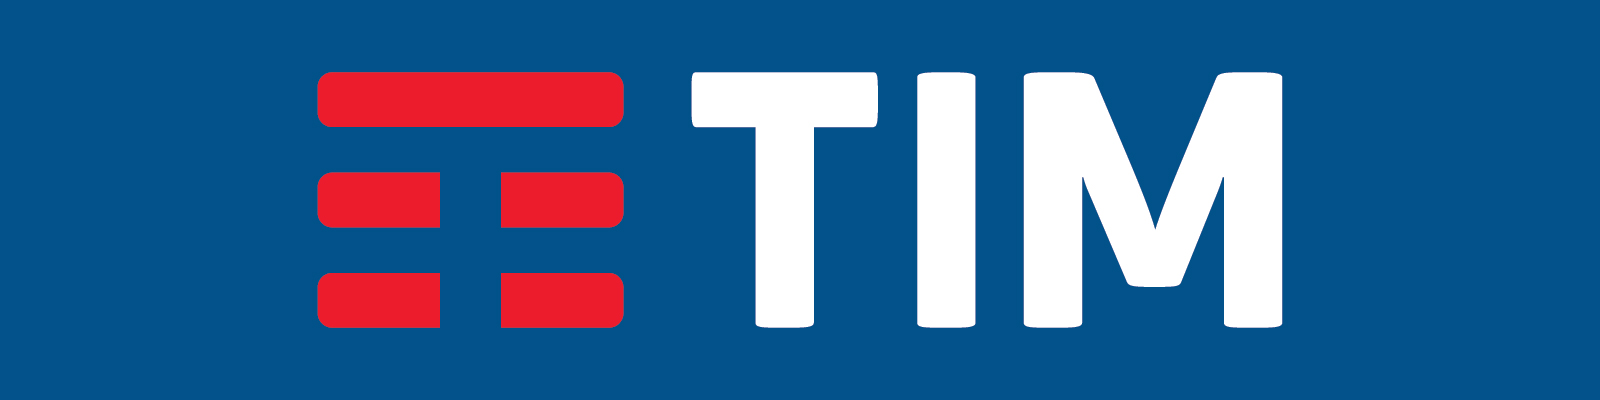 Led1_Tim-01